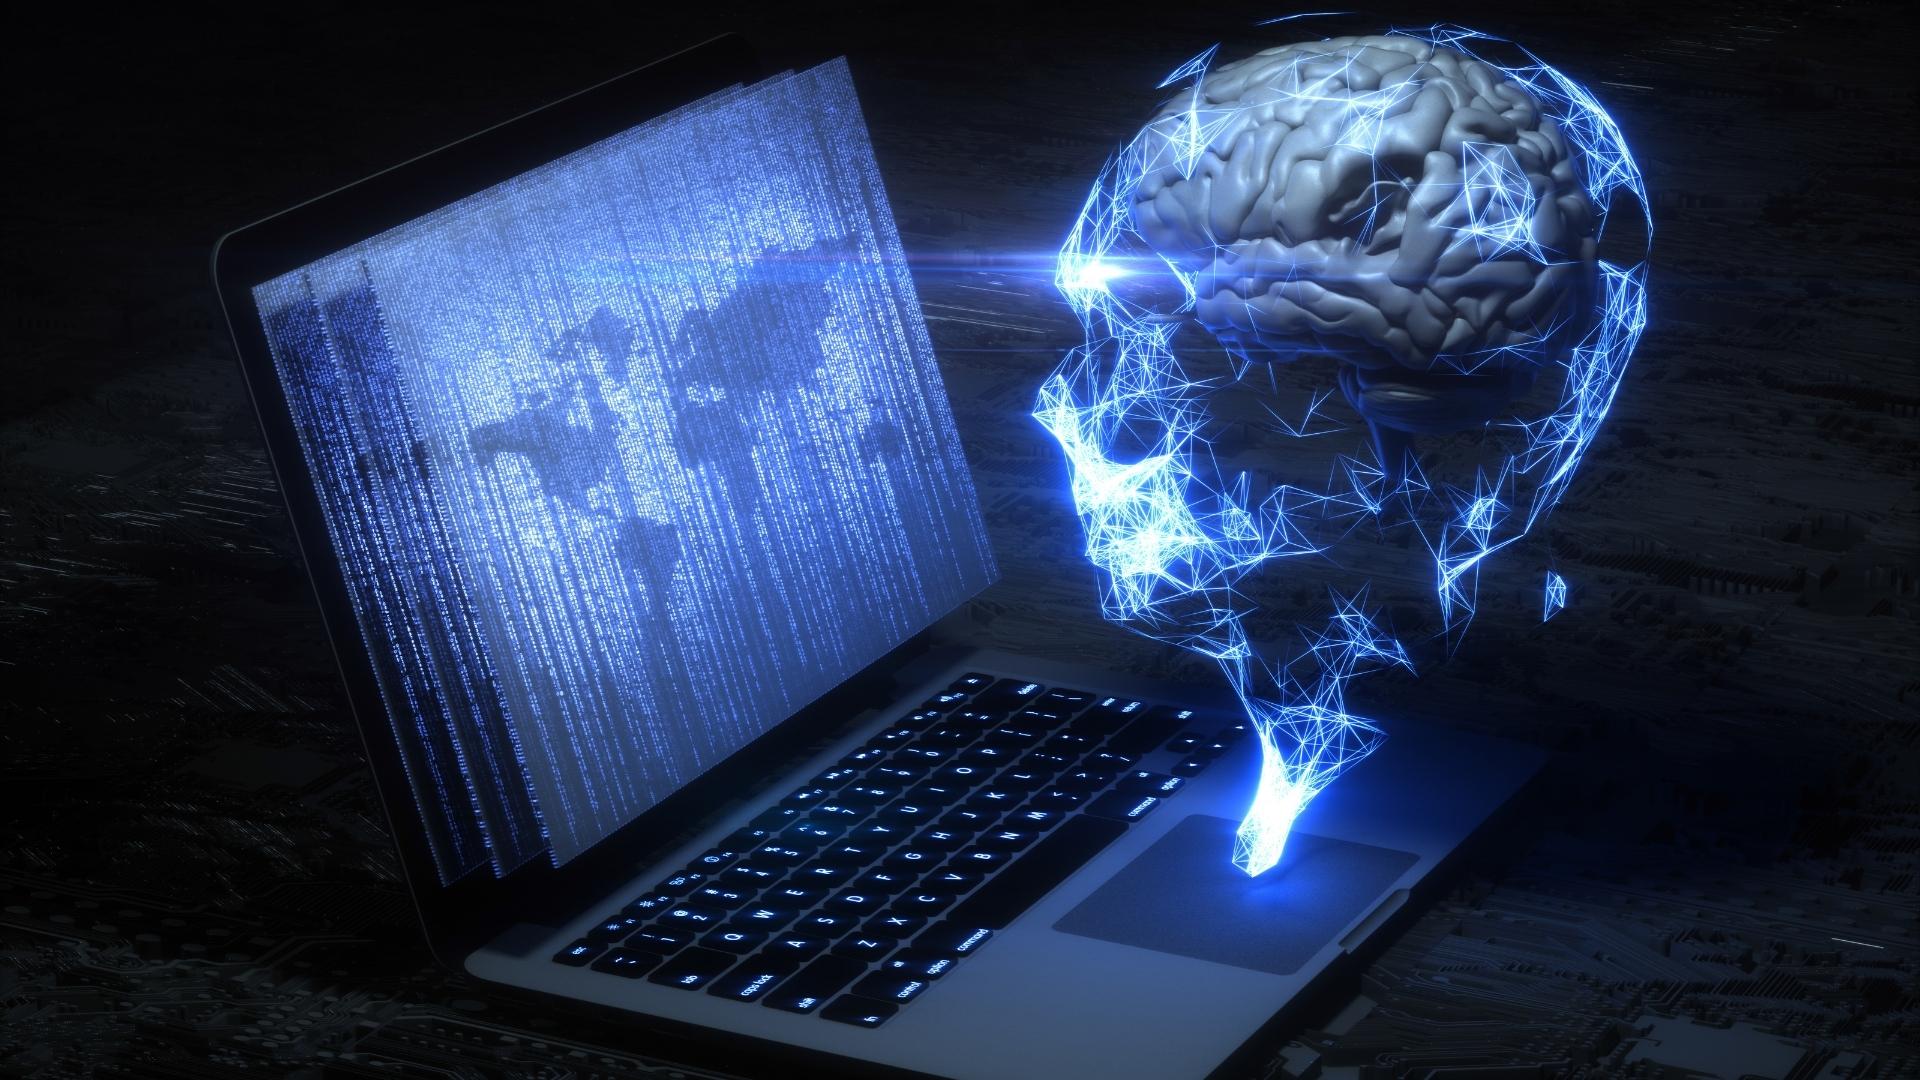 Featured image - AI - The Future of Cloud Computing